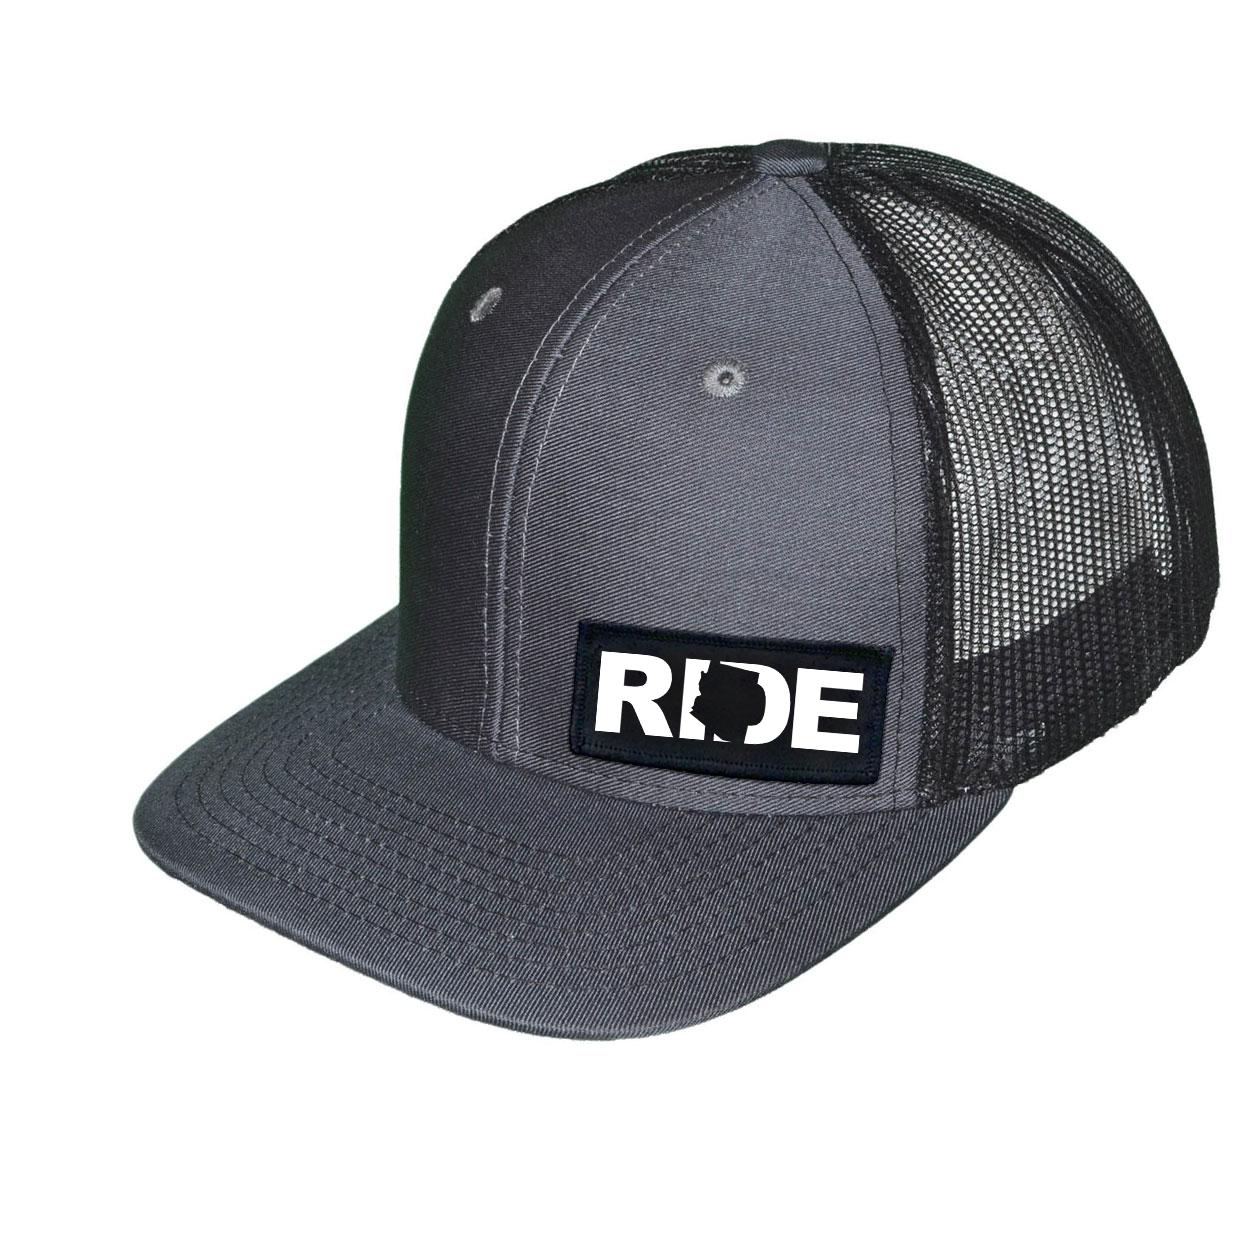 Ride Arizona Night Out Woven Patch Snapback Trucker Hat Dark Gray/Black (White Logo)